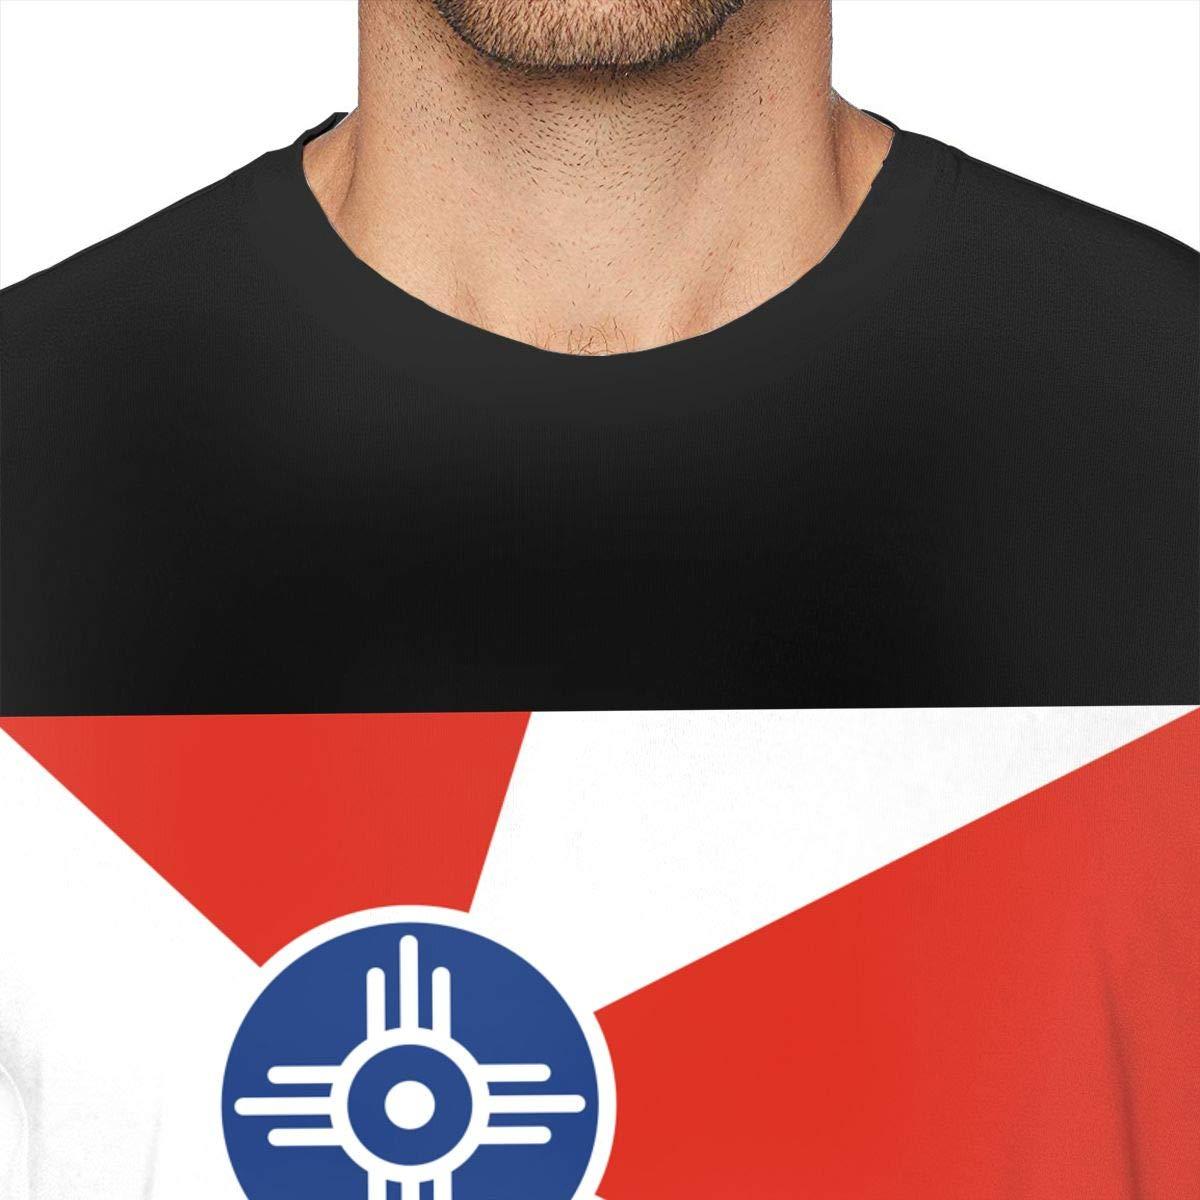 MSKKLA Flag of Wichita Strapped T-Shirt Mens Summer O-Neck T-Shirts Tees Plus Size